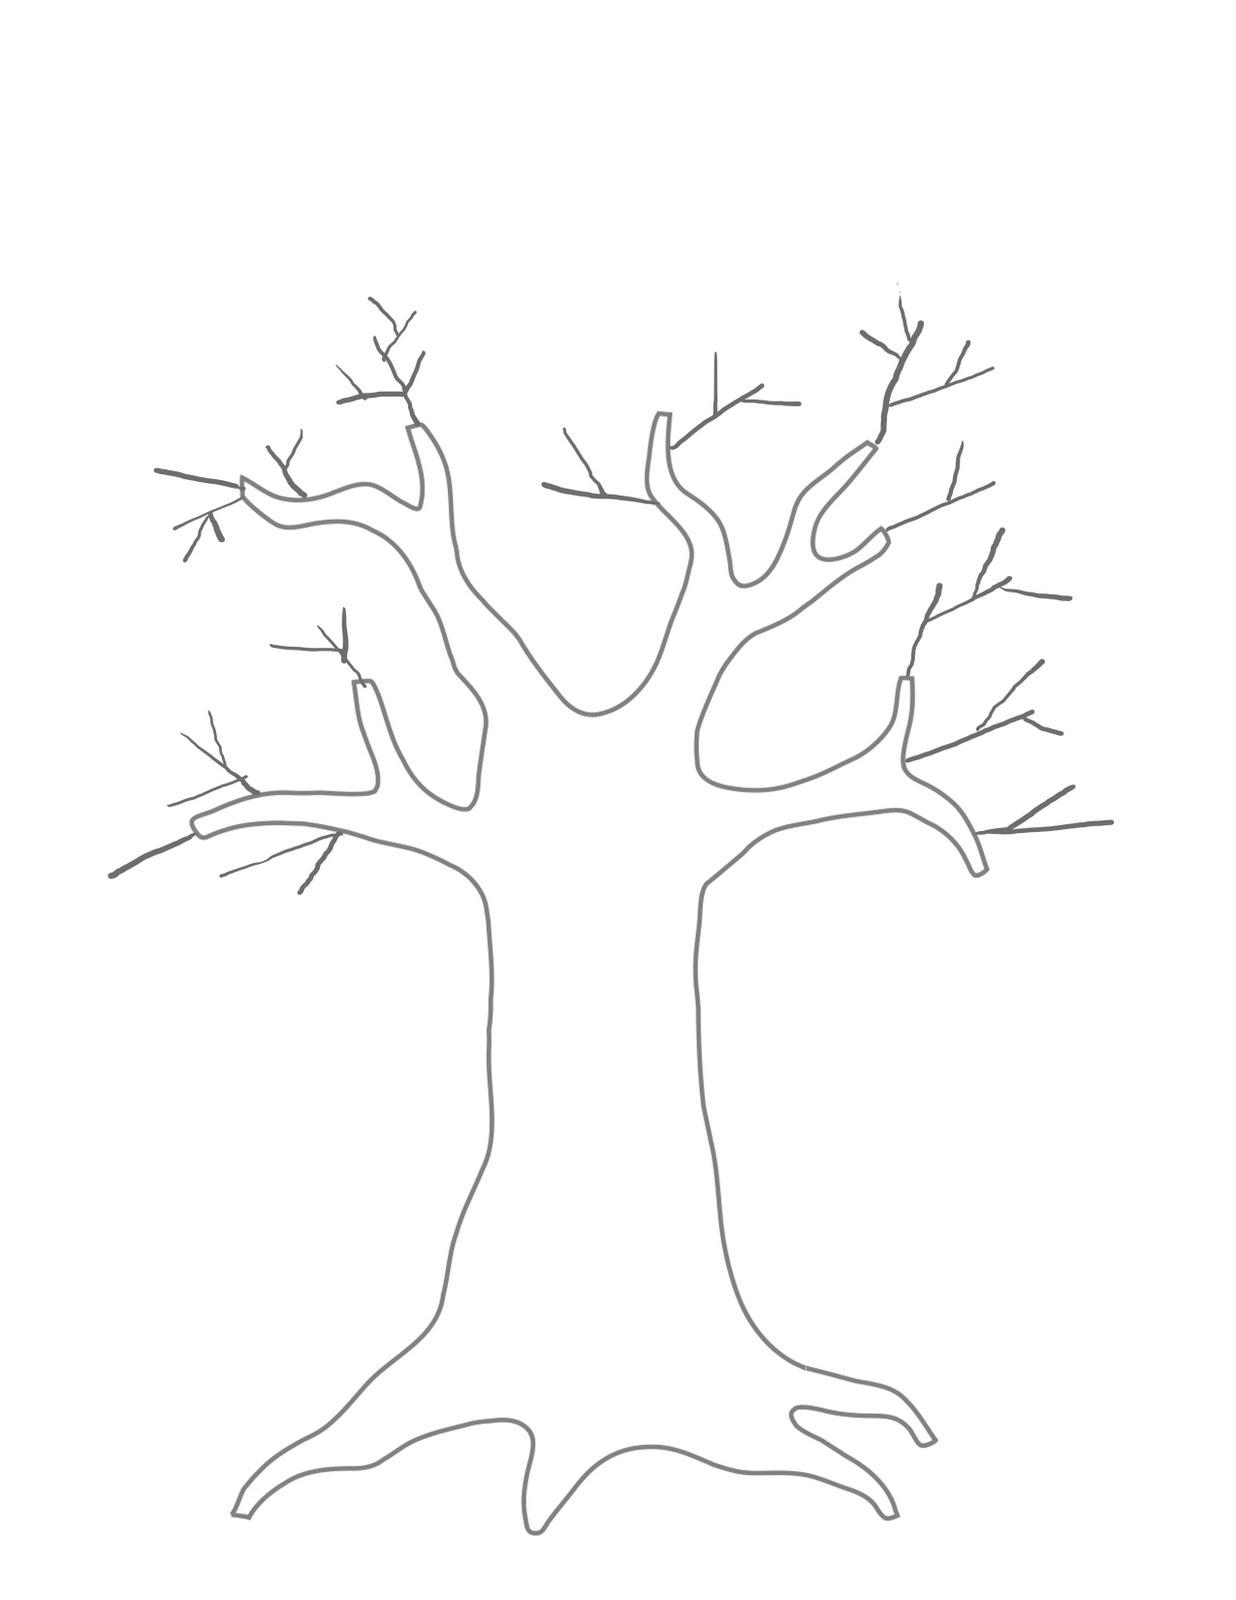 Tree Kid Drawing At Getdrawings